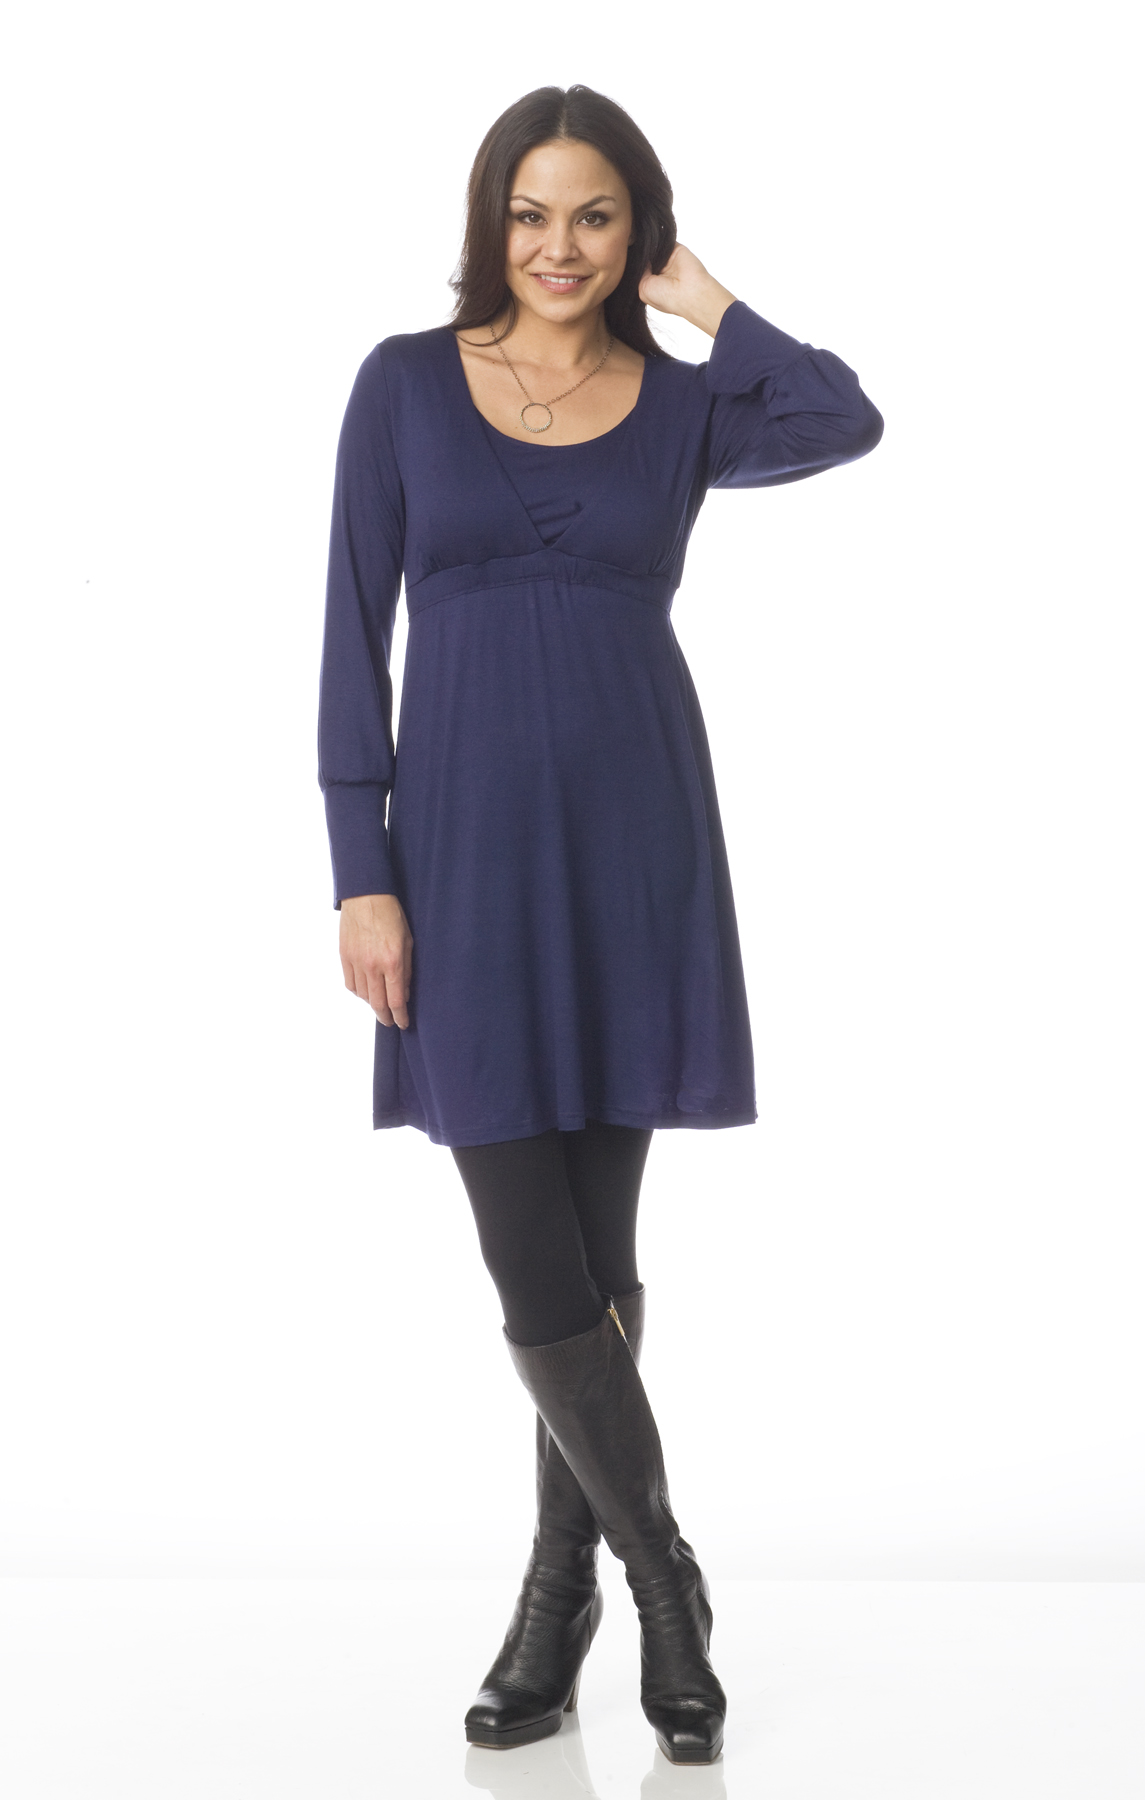 nixilu-bohemian-nursing-tunic-top-blue.jpg